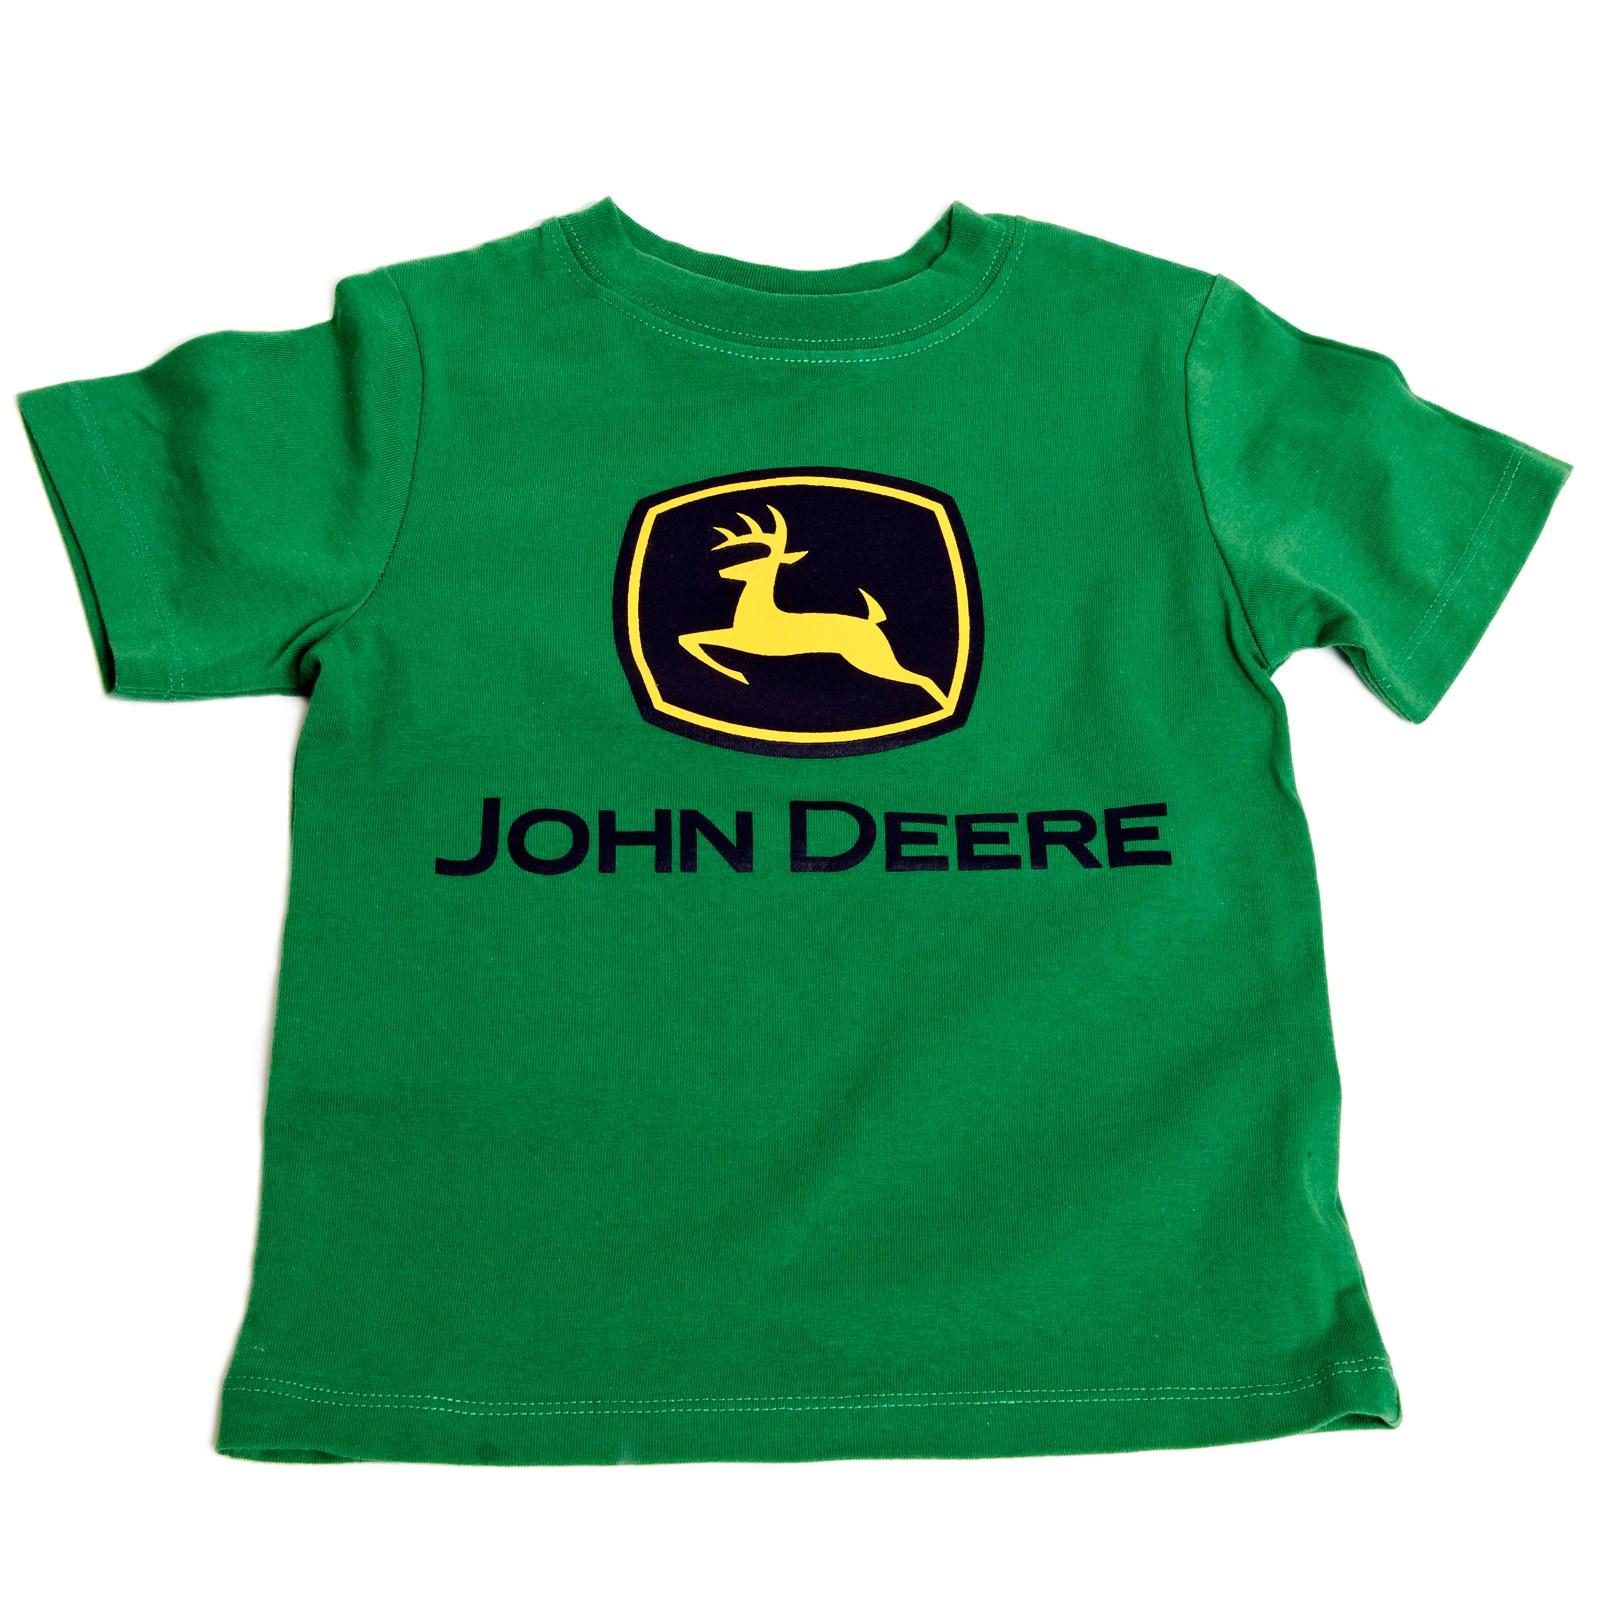 John Deere Toddler T Shirt